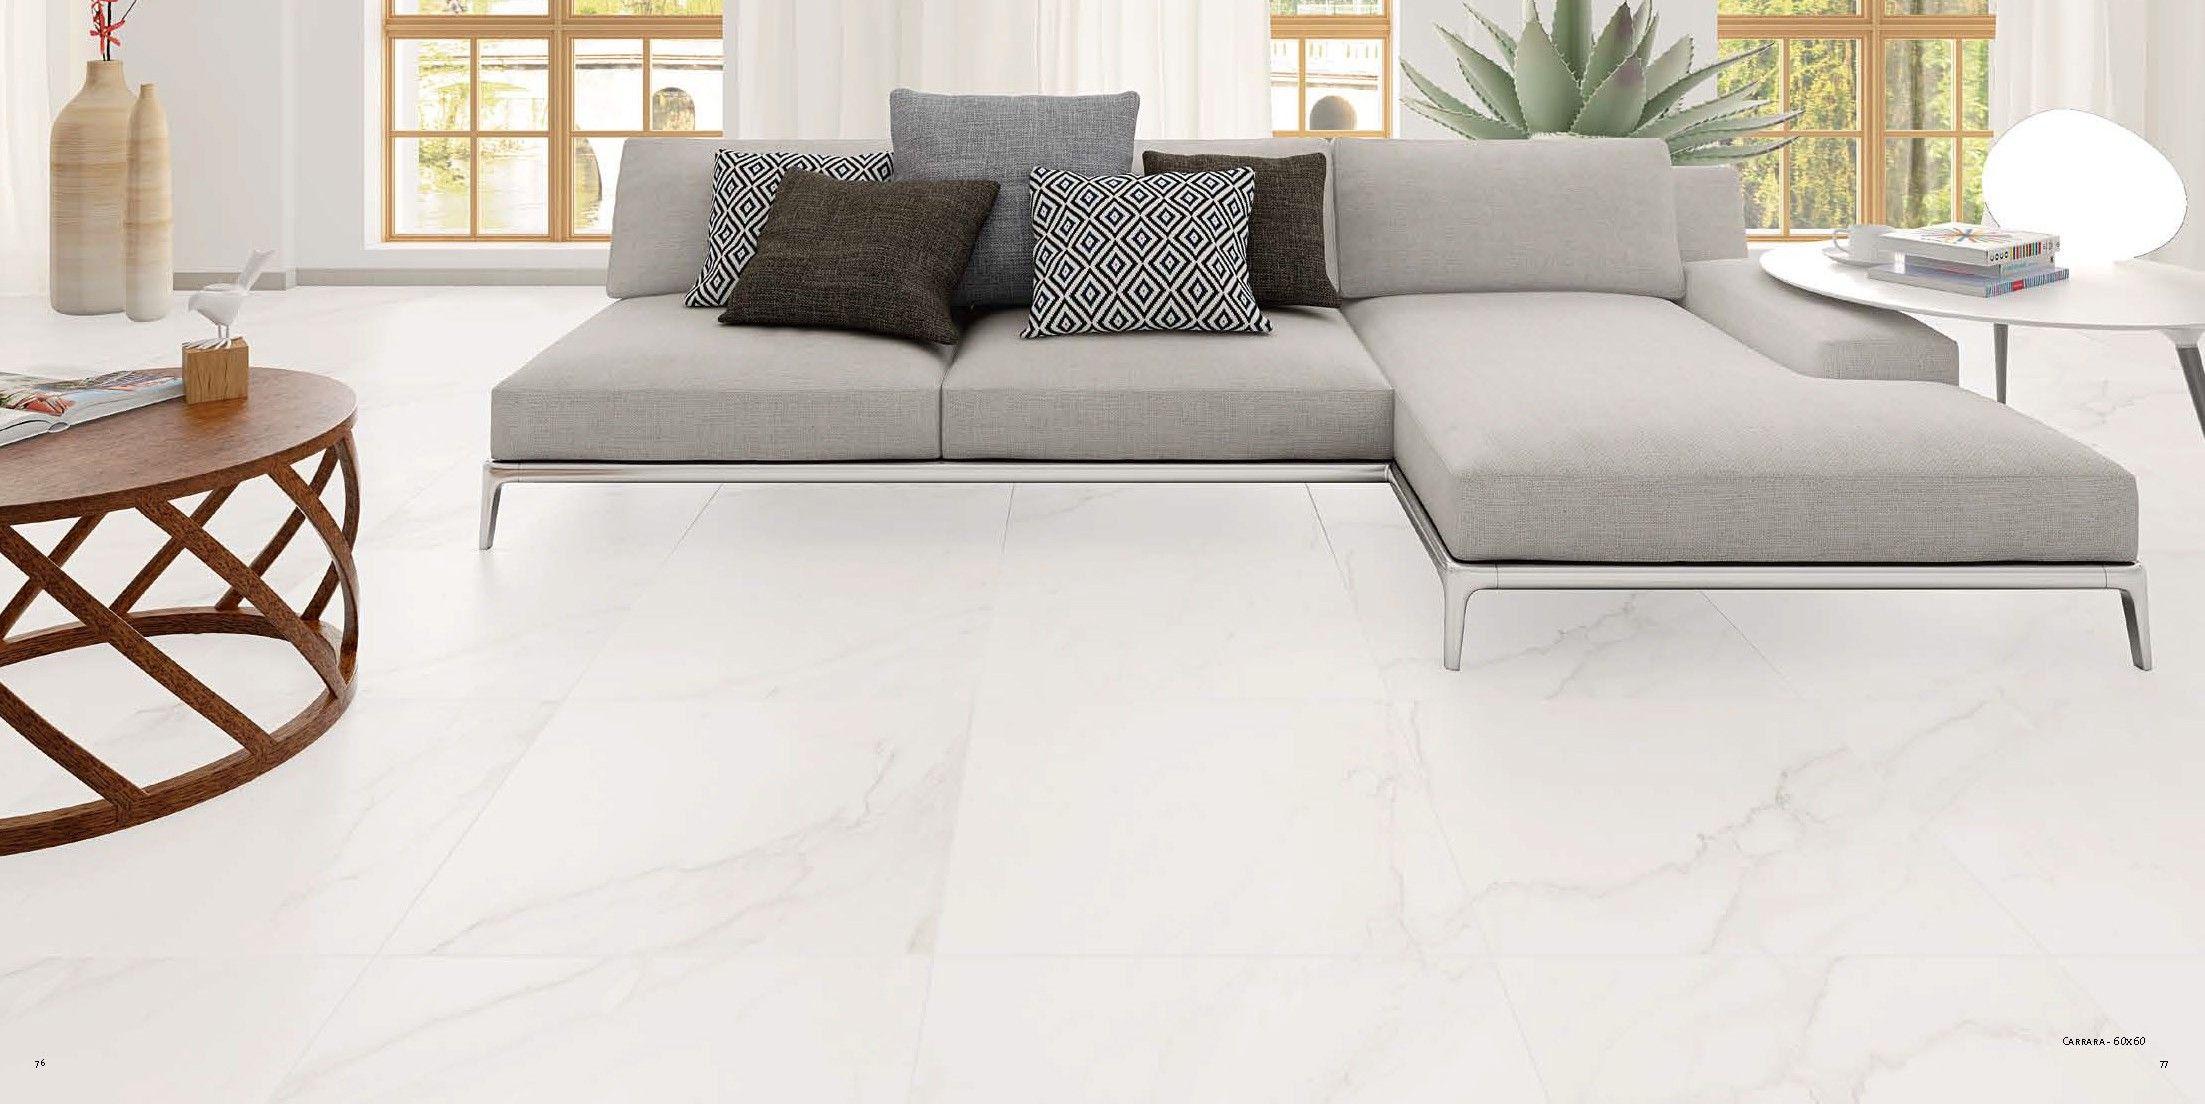 Marmores Carrara 60x60 Carrelage Marbre Blanc Carrelage Marbre